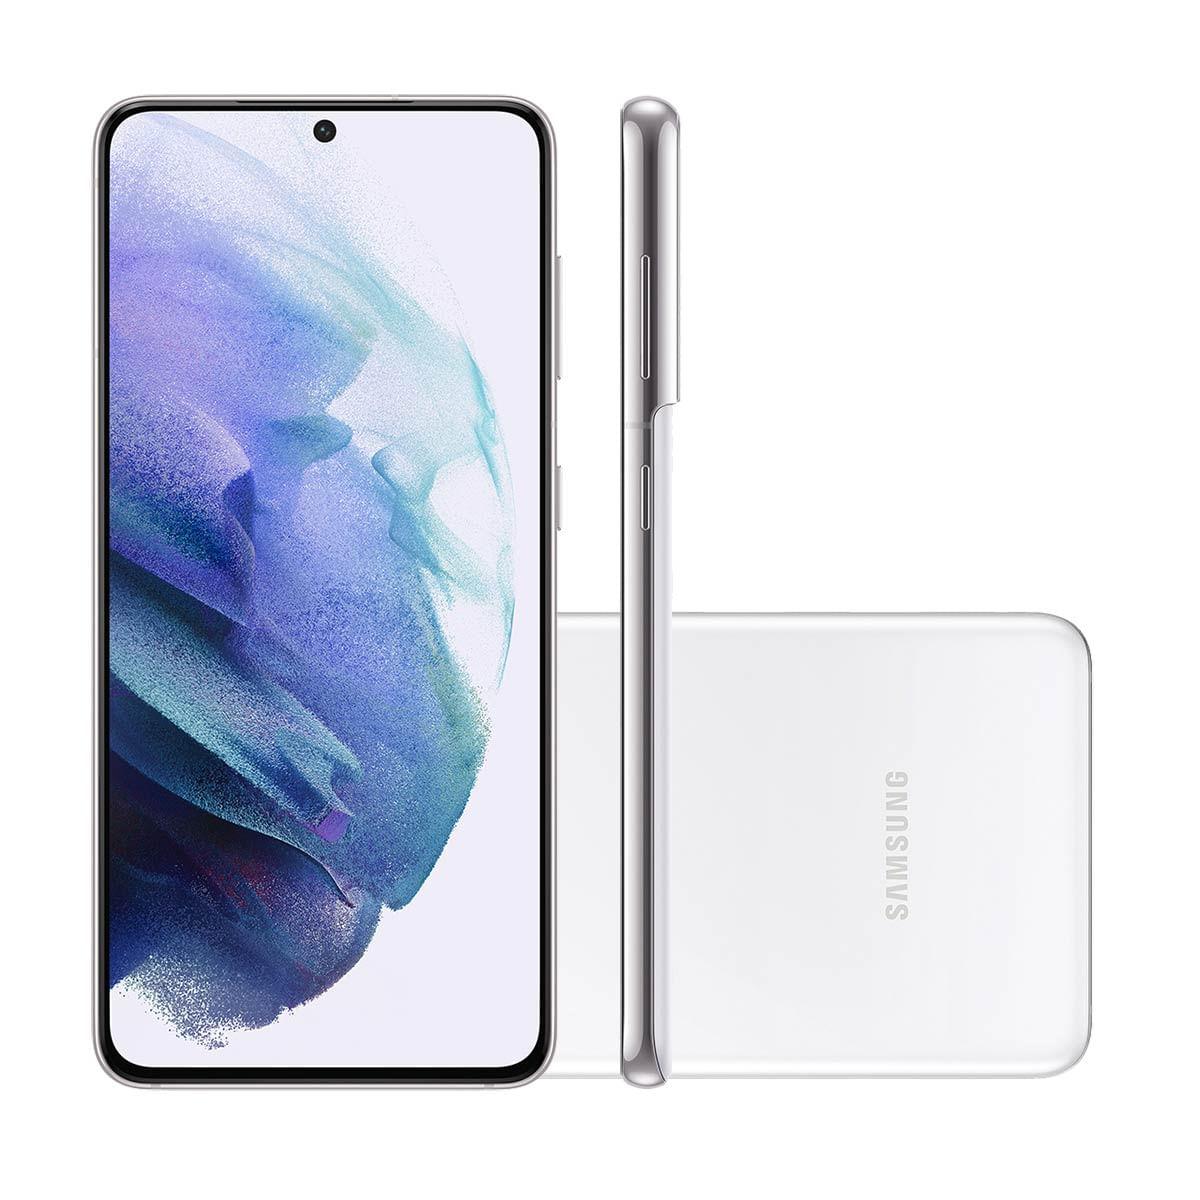 "Smartphone Samsung Galaxy S21 5G 128GB Branco Tela 6.2"" Câmera Tripla 64MP Selfie 10MP Dual Chip Android 11"